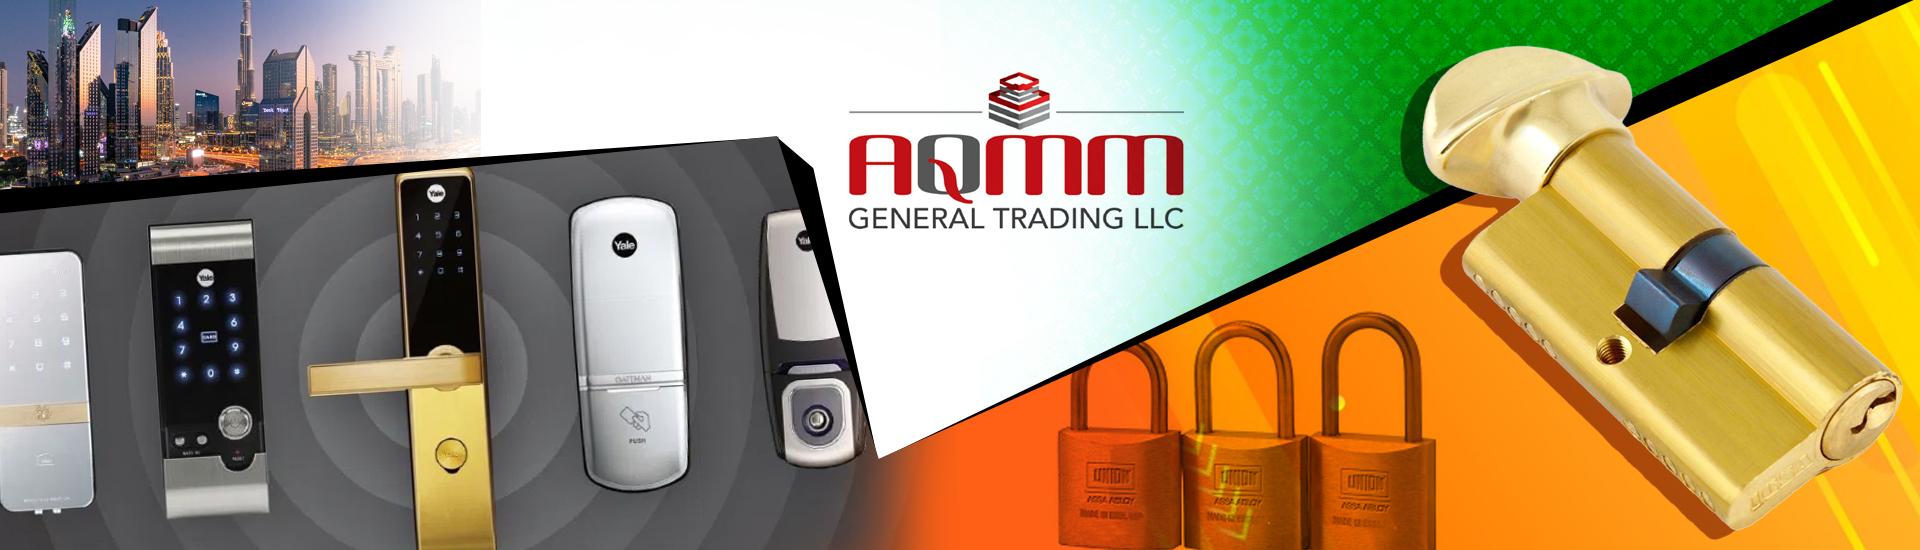 AQMM GENERAL TRADING LLC